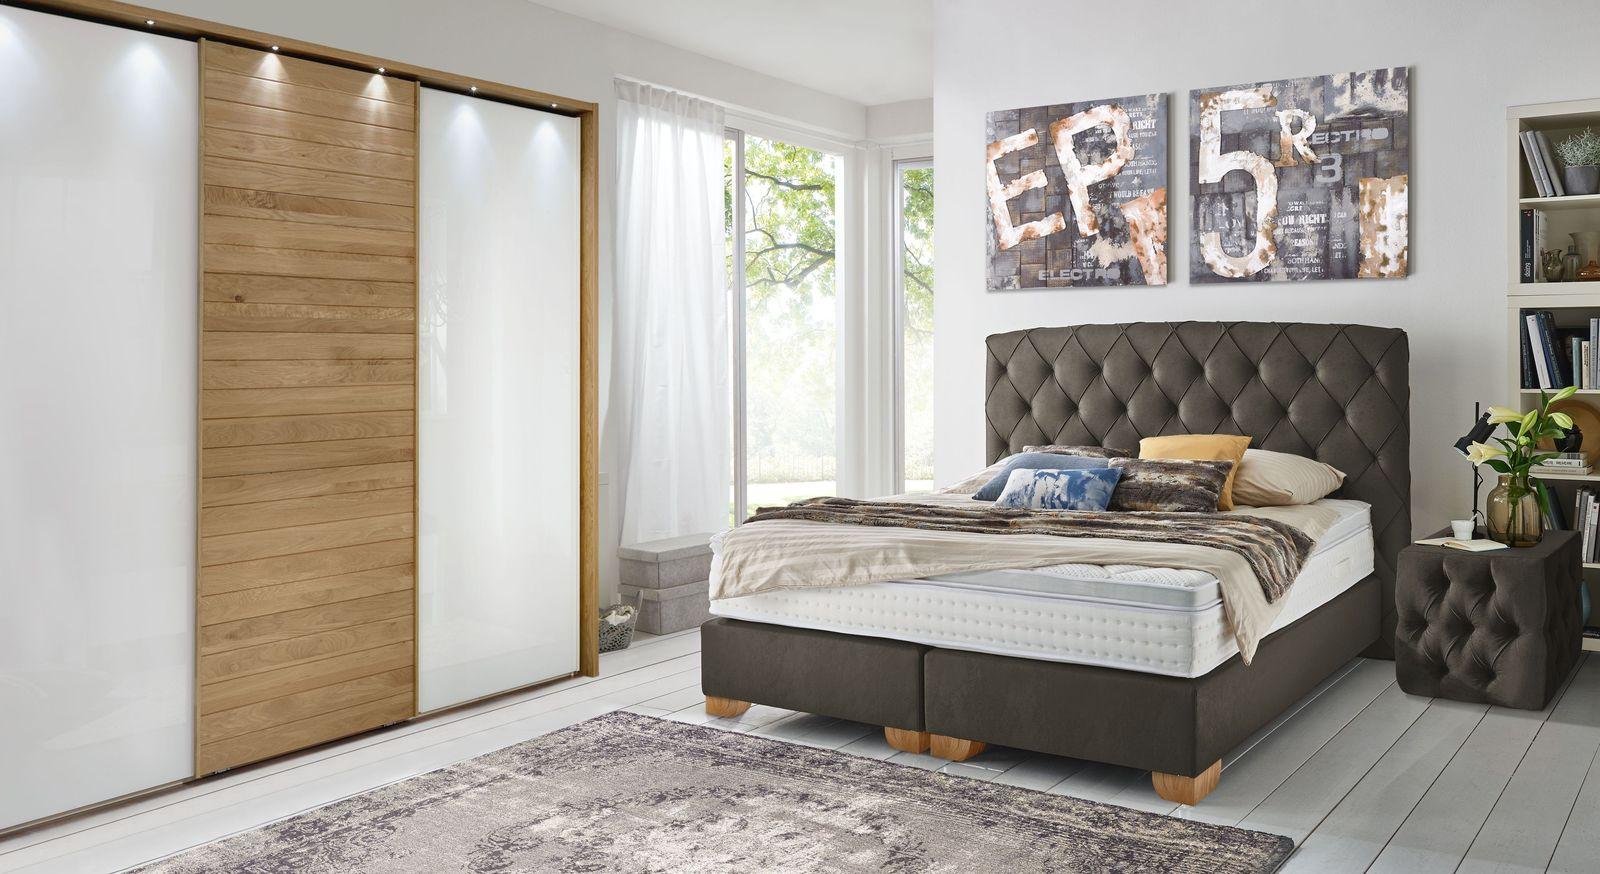 Boxspringbett Sunnyvale mit passenden Schlafzimmermöbeln